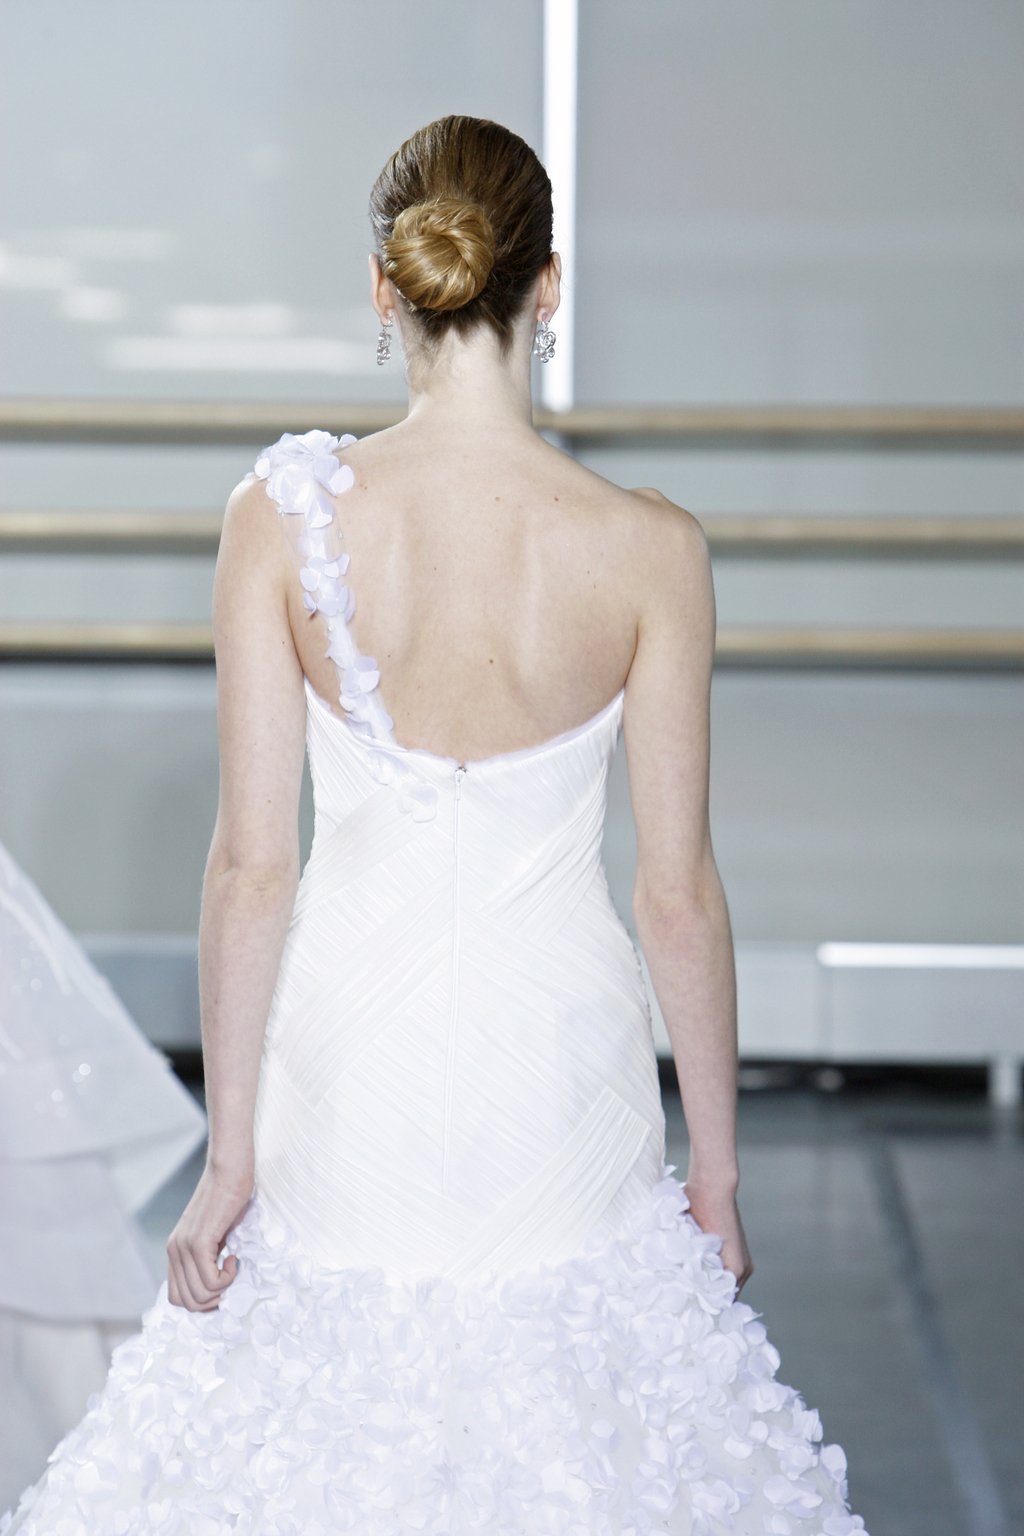 Rivini-wedding-dress-fall-2013-bridal-gown-biancaneve-back.full